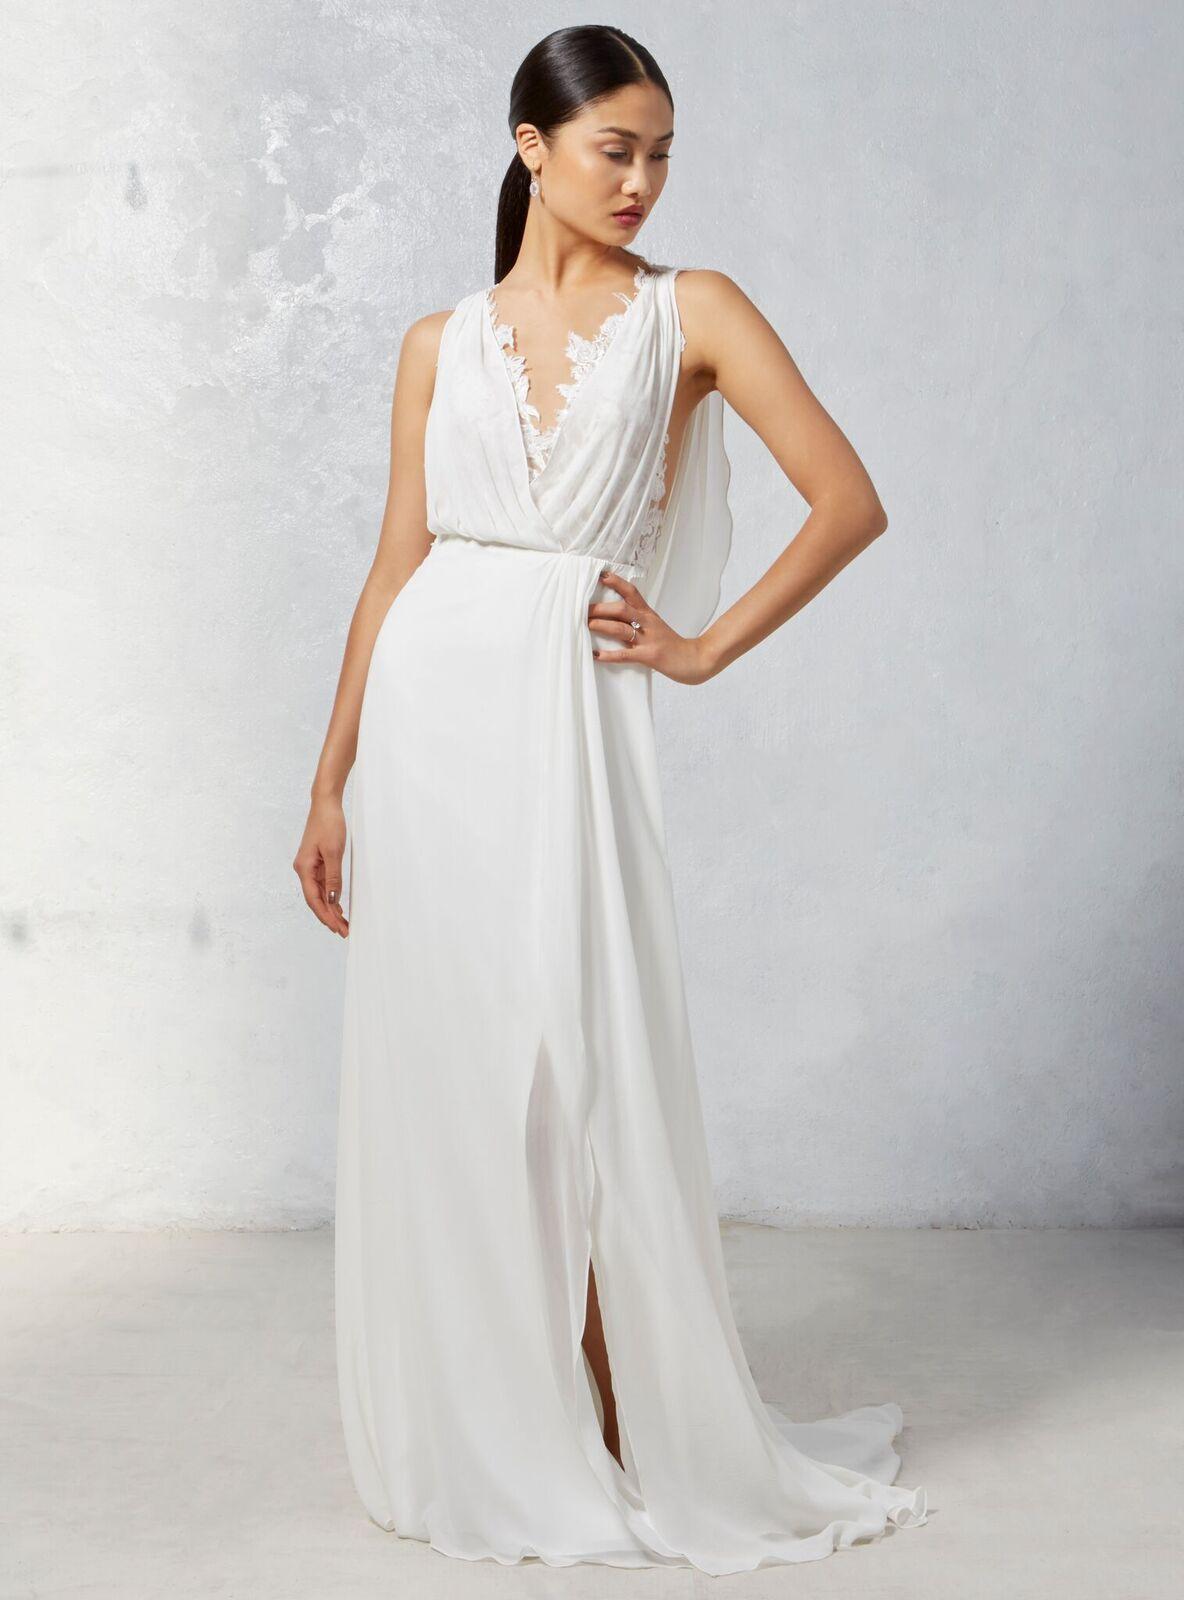 Draped Grecian Wedding Dress